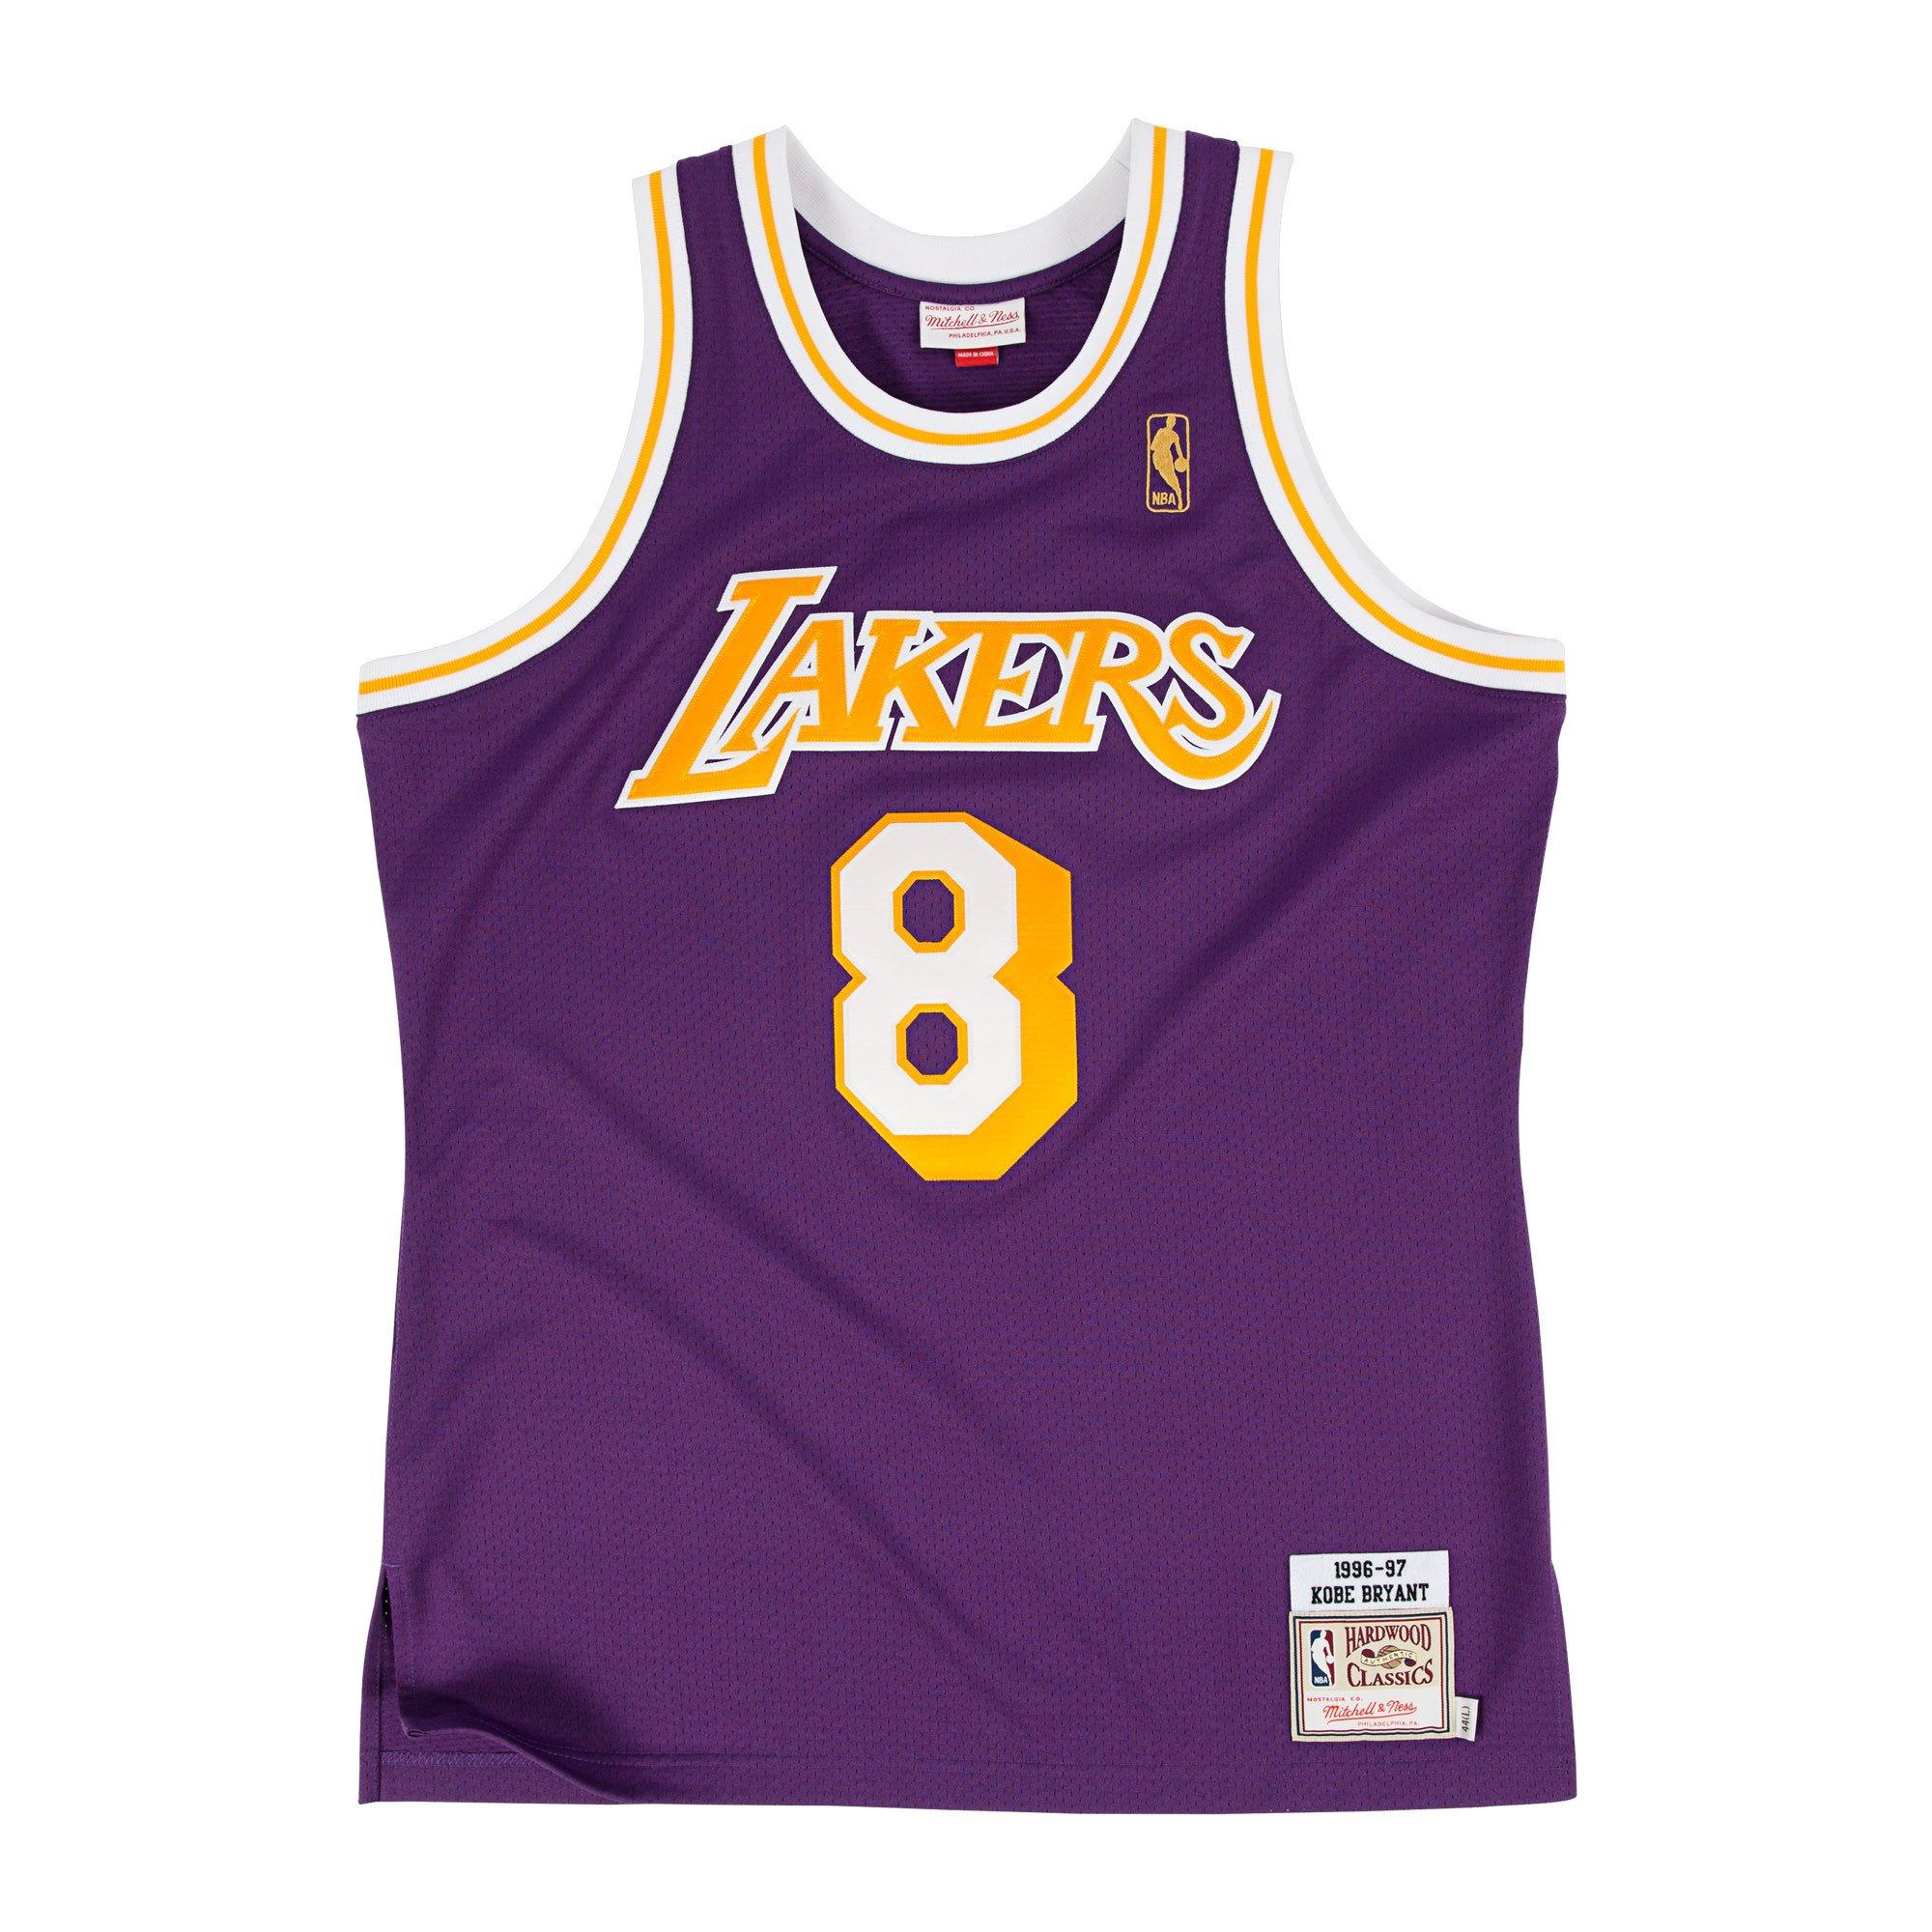 61b95d132 Amazon.com  Mitchell   Ness AUTHENTIC Kobe Bryant 1996-97 Rookie Year Jersey  LA Lakers NBA (S (36)) (0885587365823)  Books